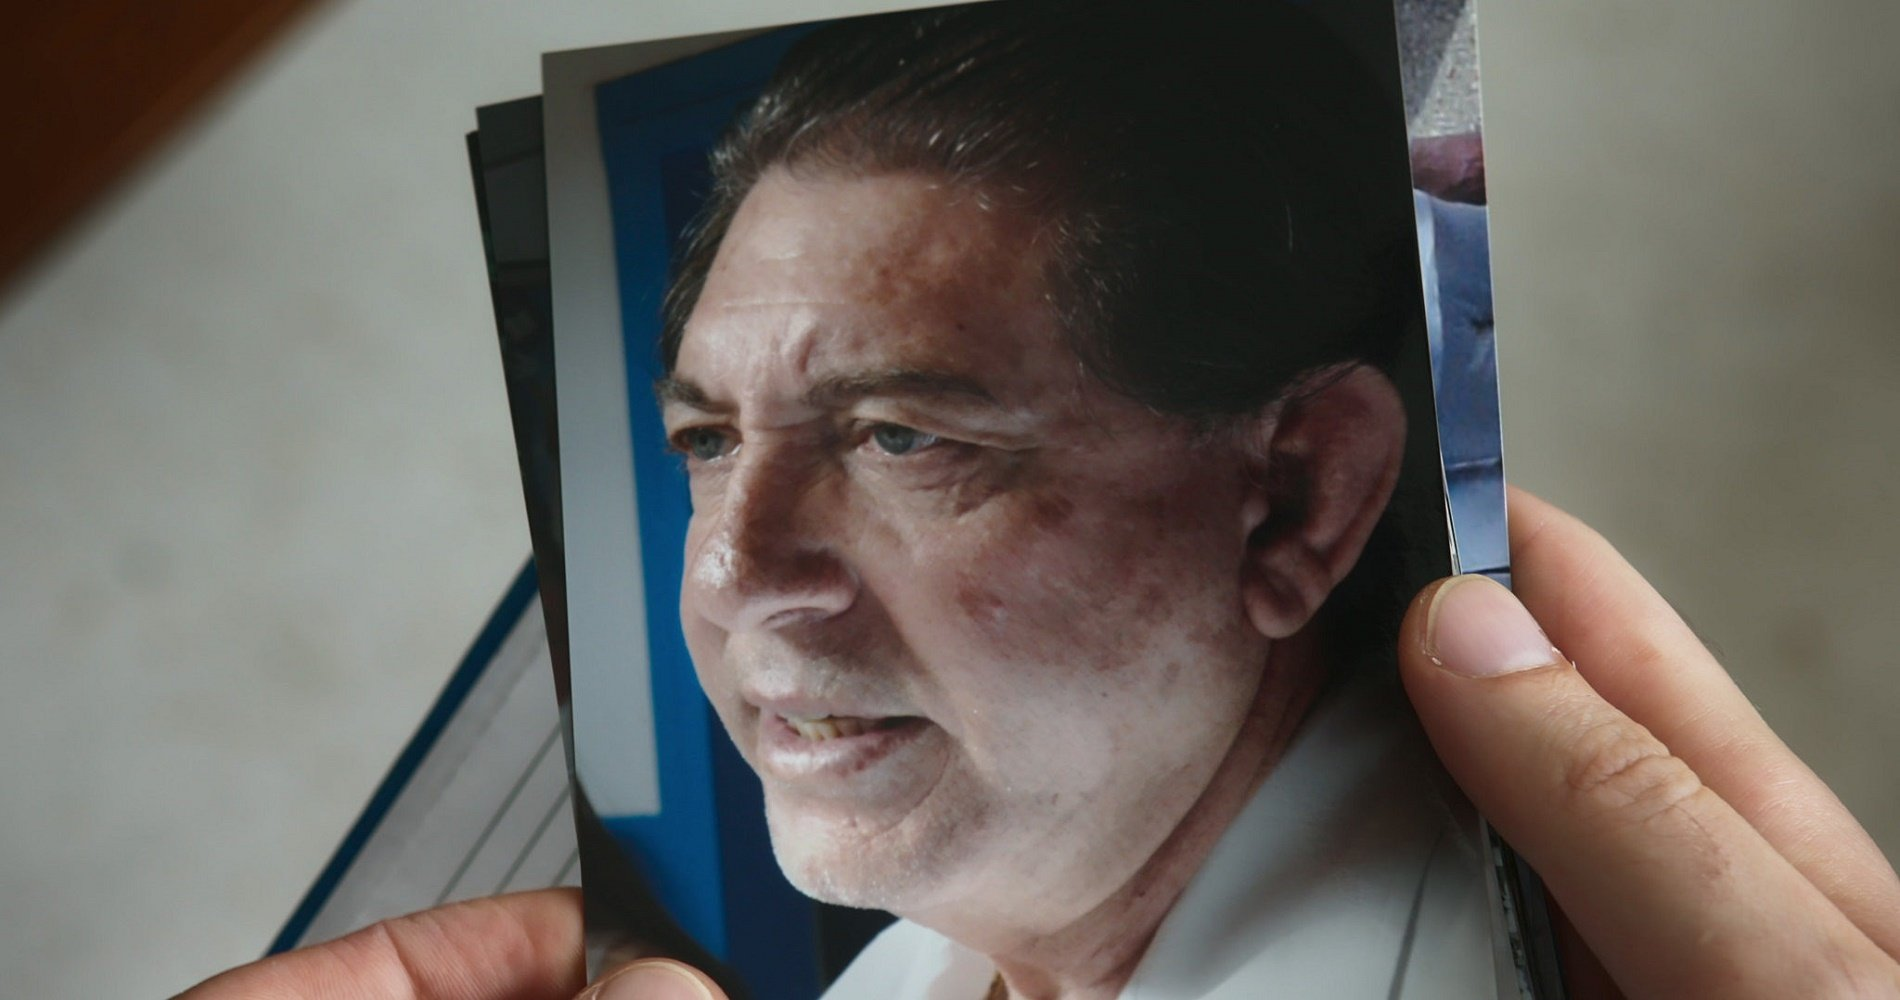 João Teixeira de Faria bei Netflix